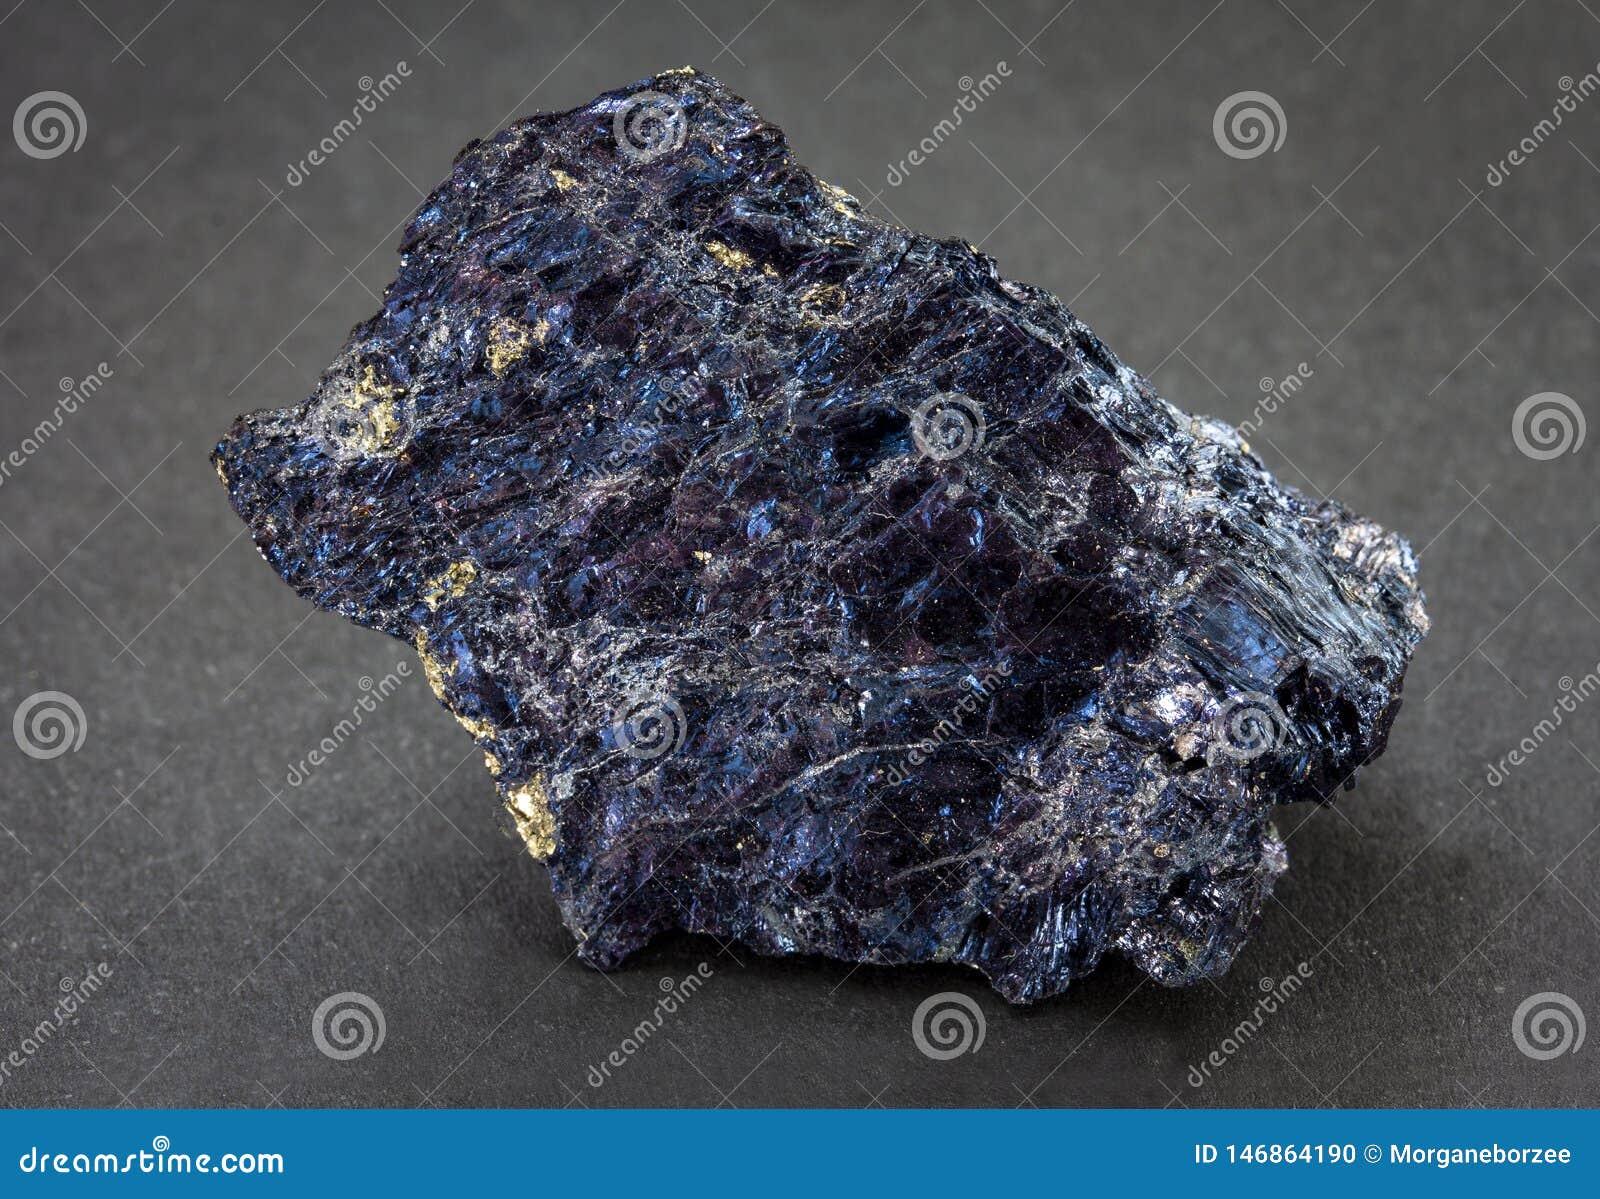 Covellite Also Known As Covelline Is A Rare Copper Sulfide